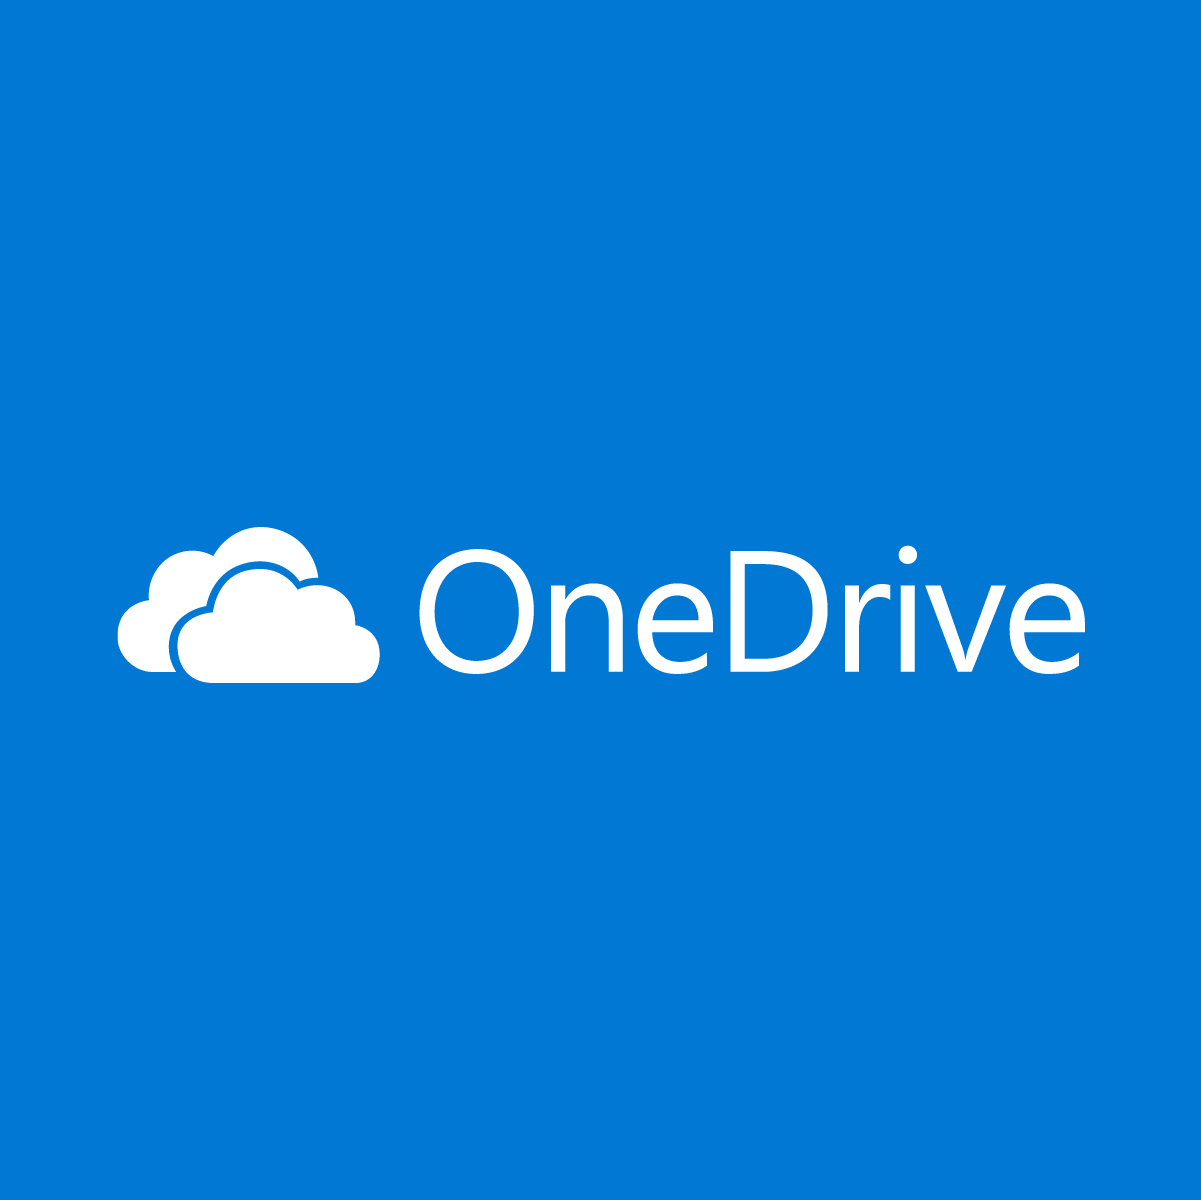 Microsoft Announces OneDrive Personal Vault 9